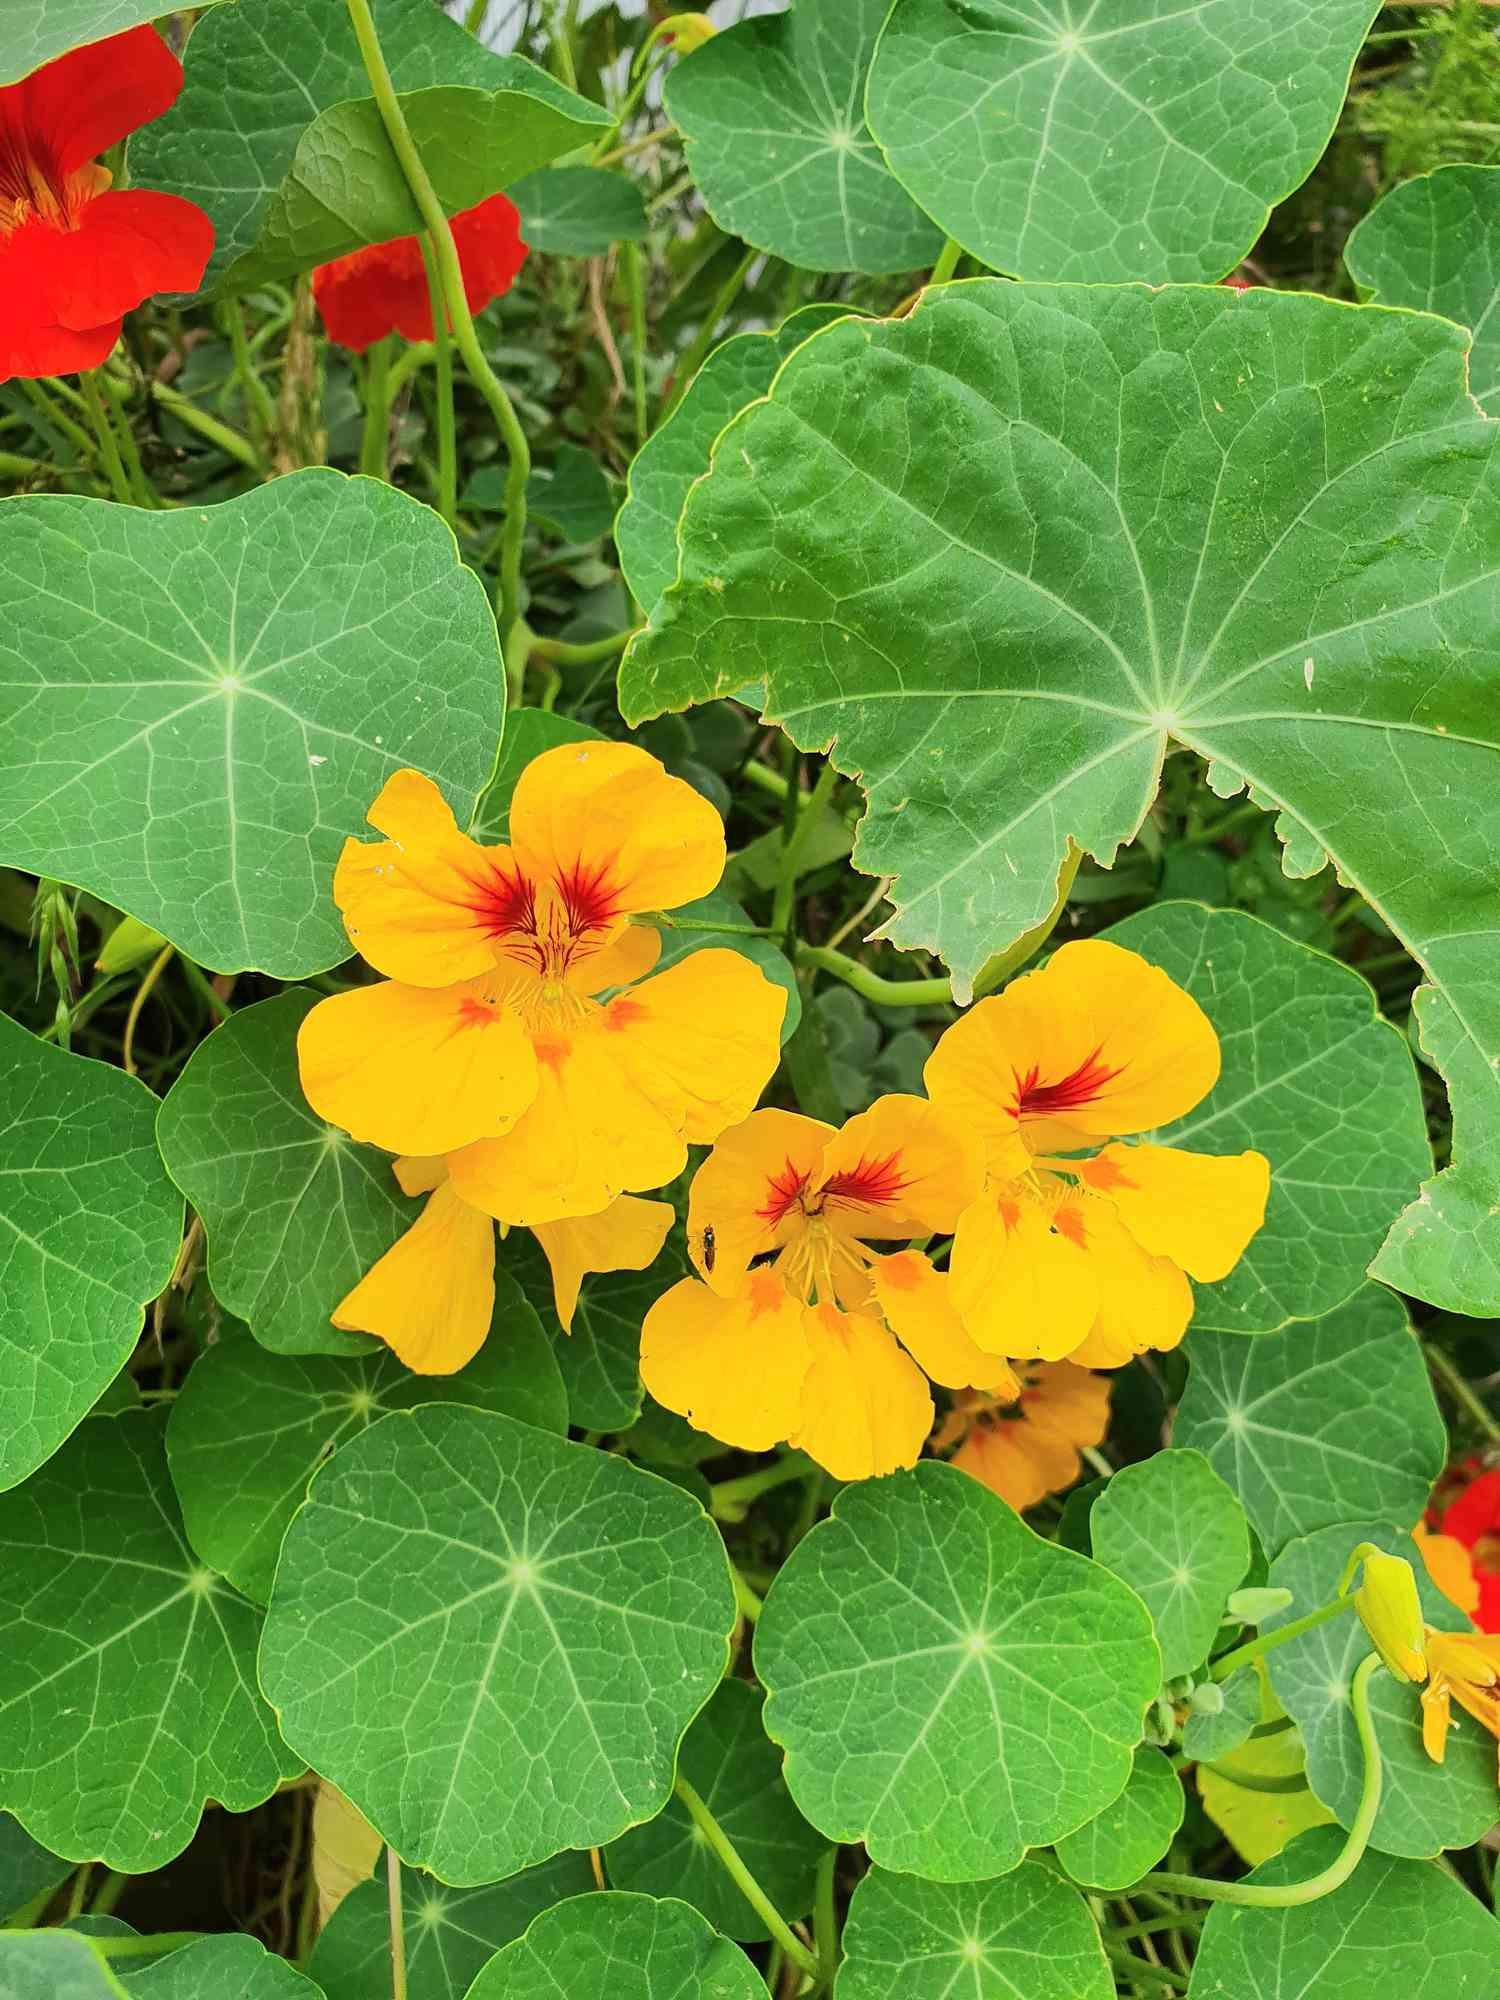 nasturtium plants in garden with orange and yellow flowers